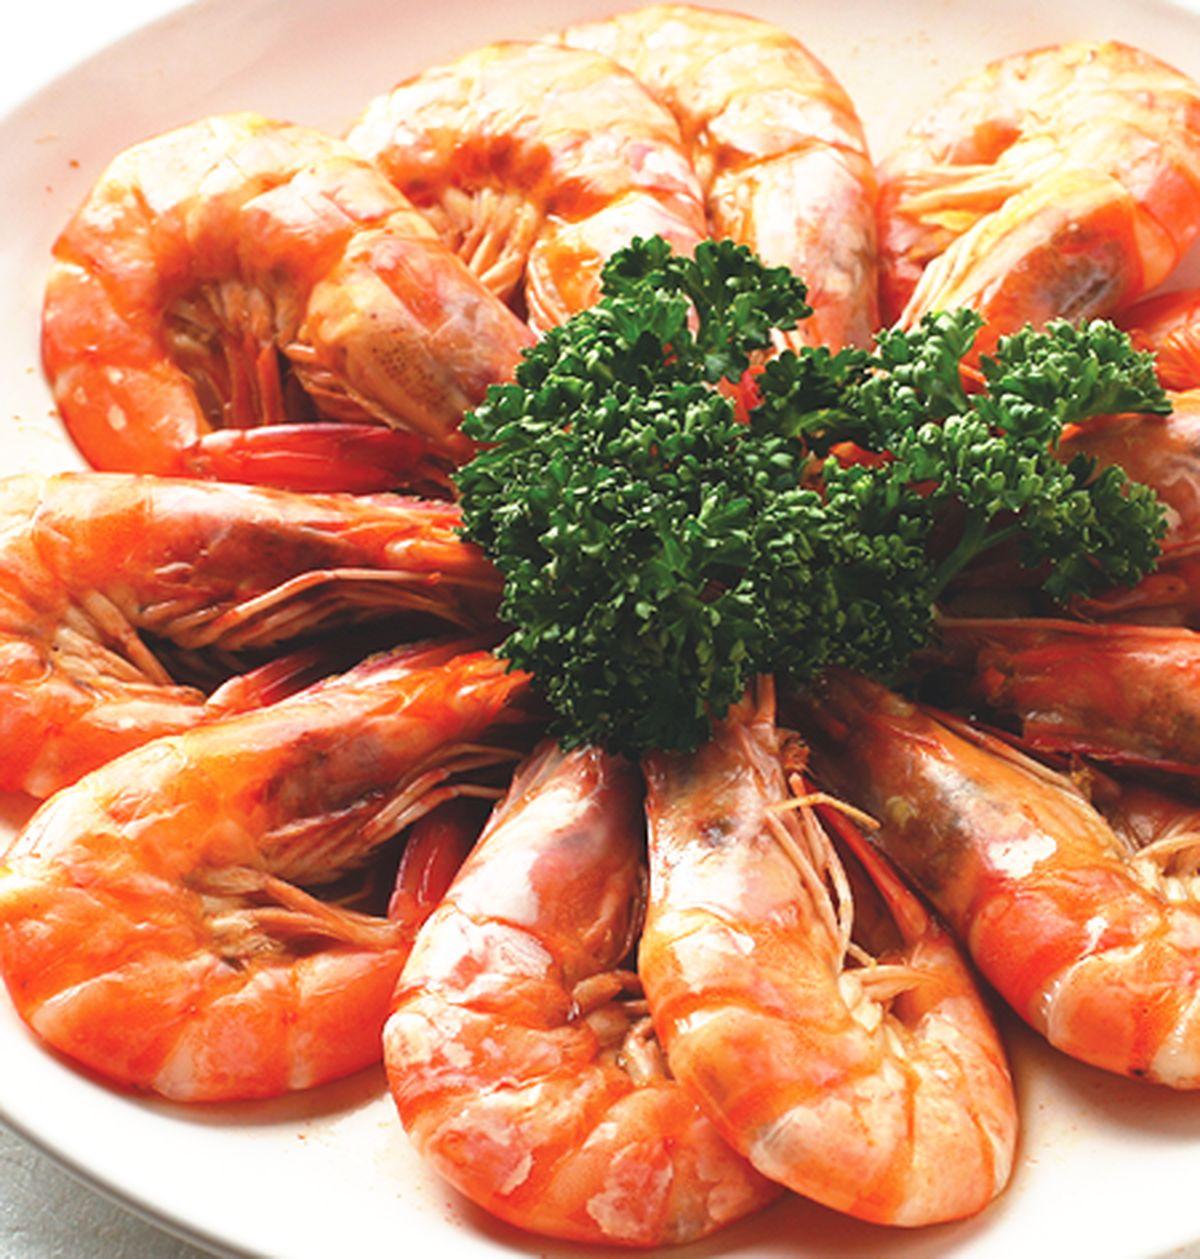 食譜:鹽焗鮮蝦